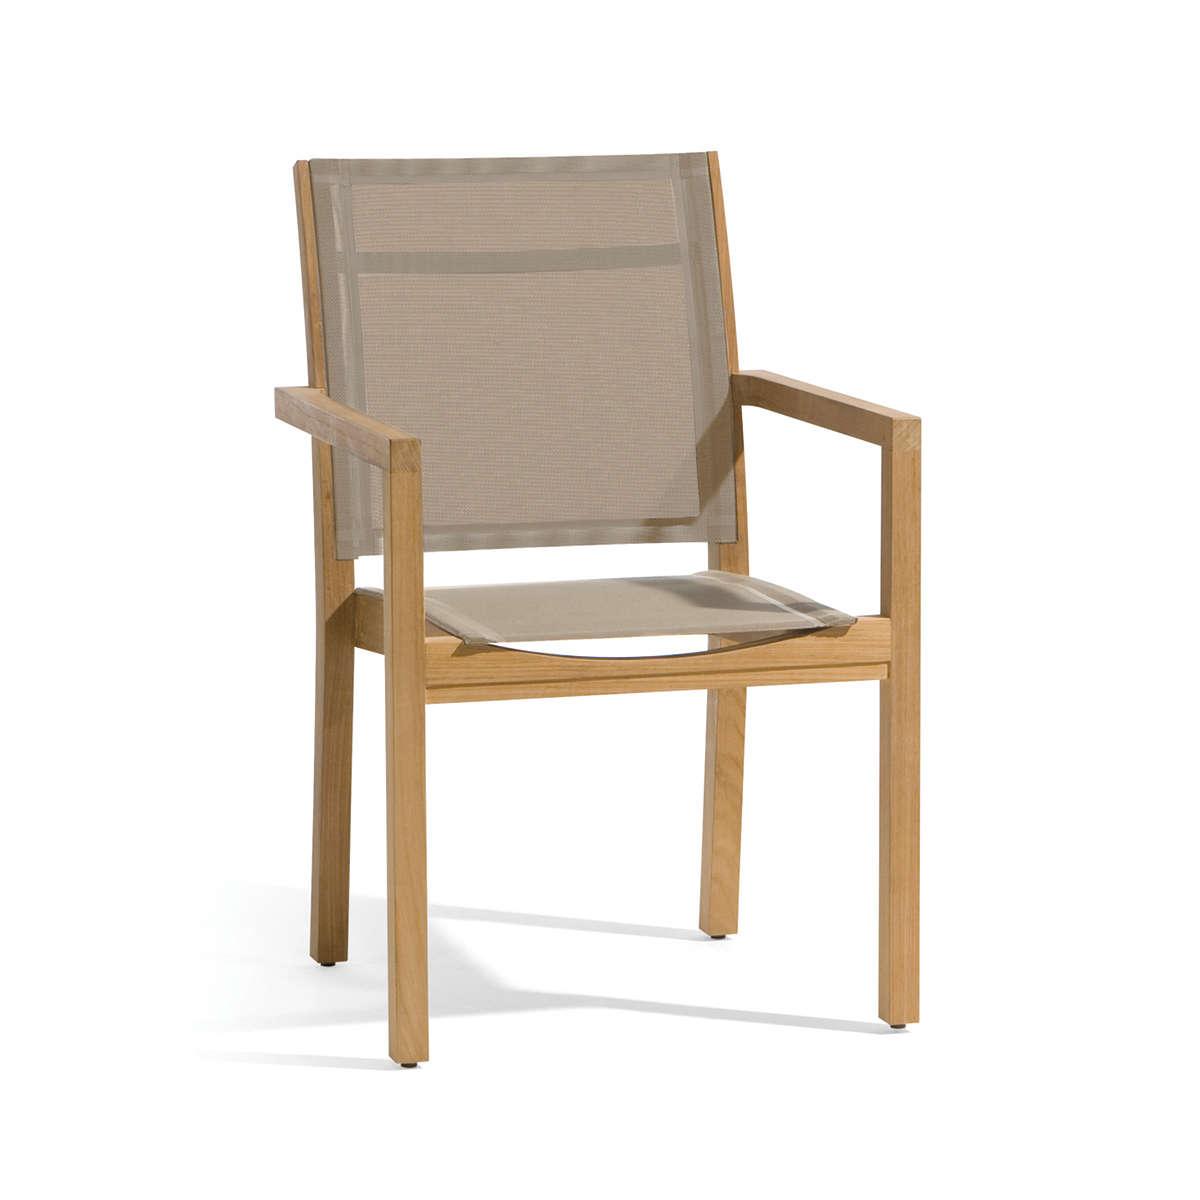 Siena Textiles Teak Dining Chair